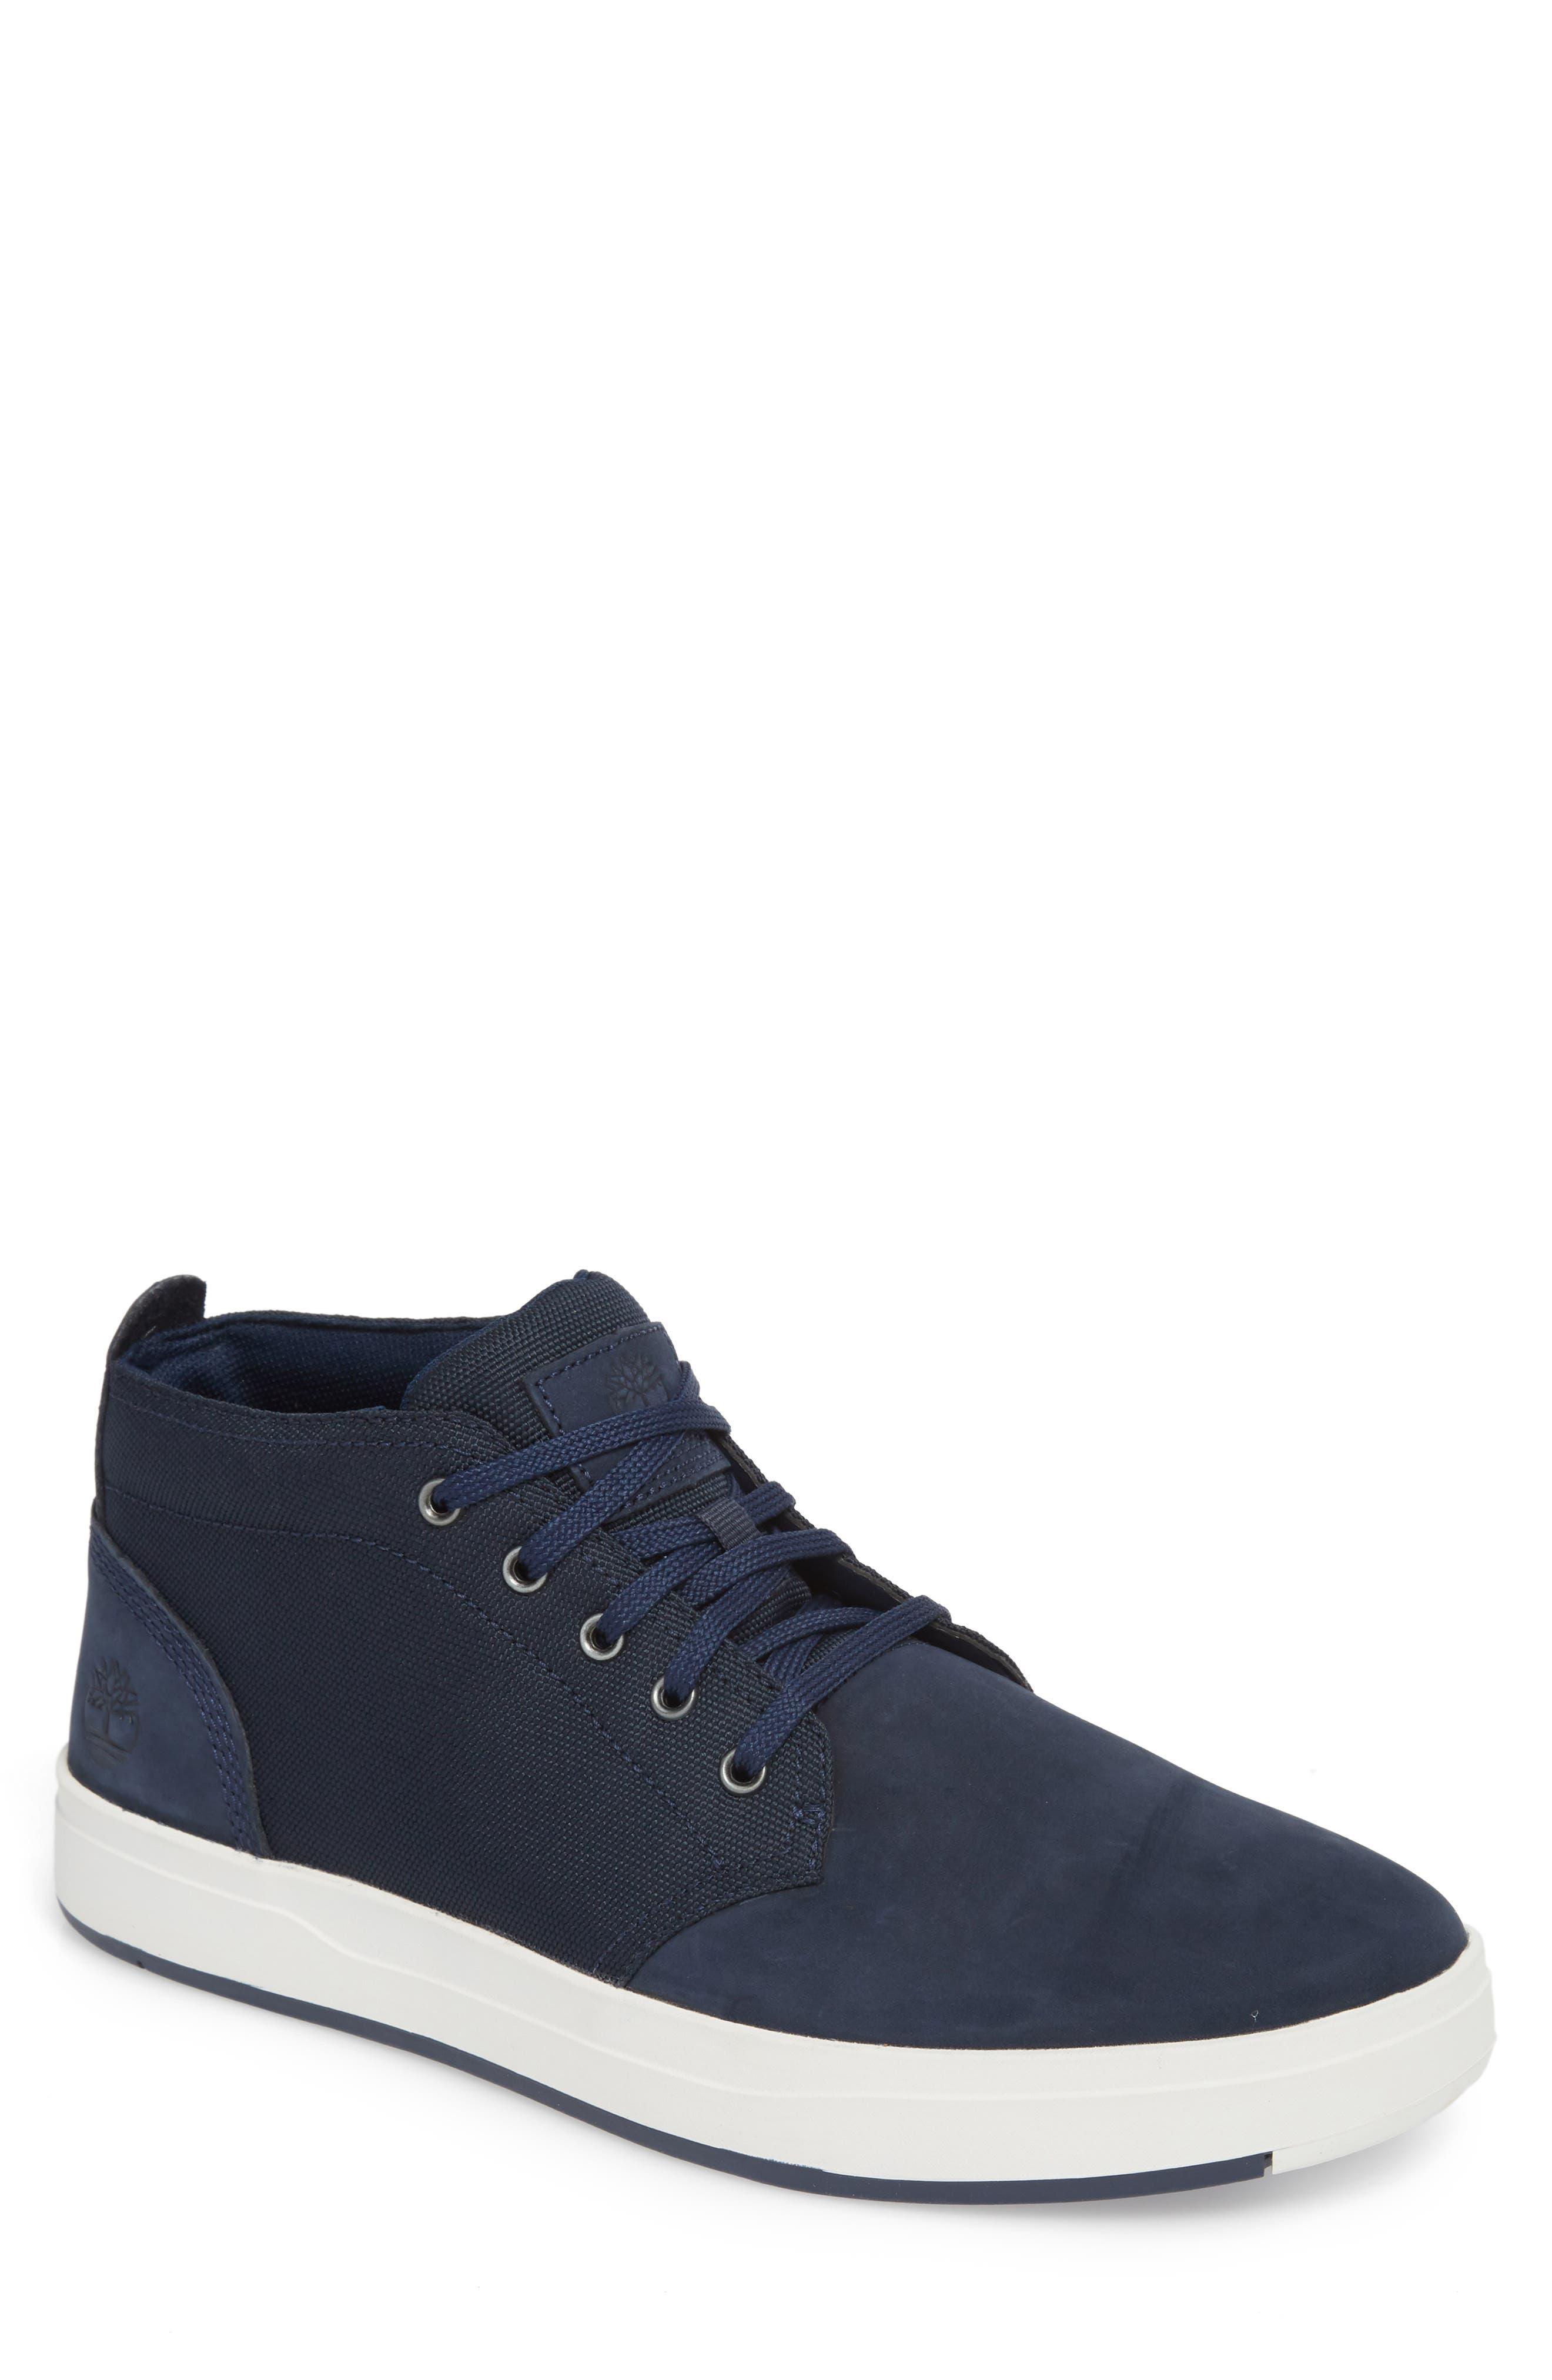 Davis Square Mid Top Sneaker,                             Main thumbnail 1, color,                             Black/ Blue